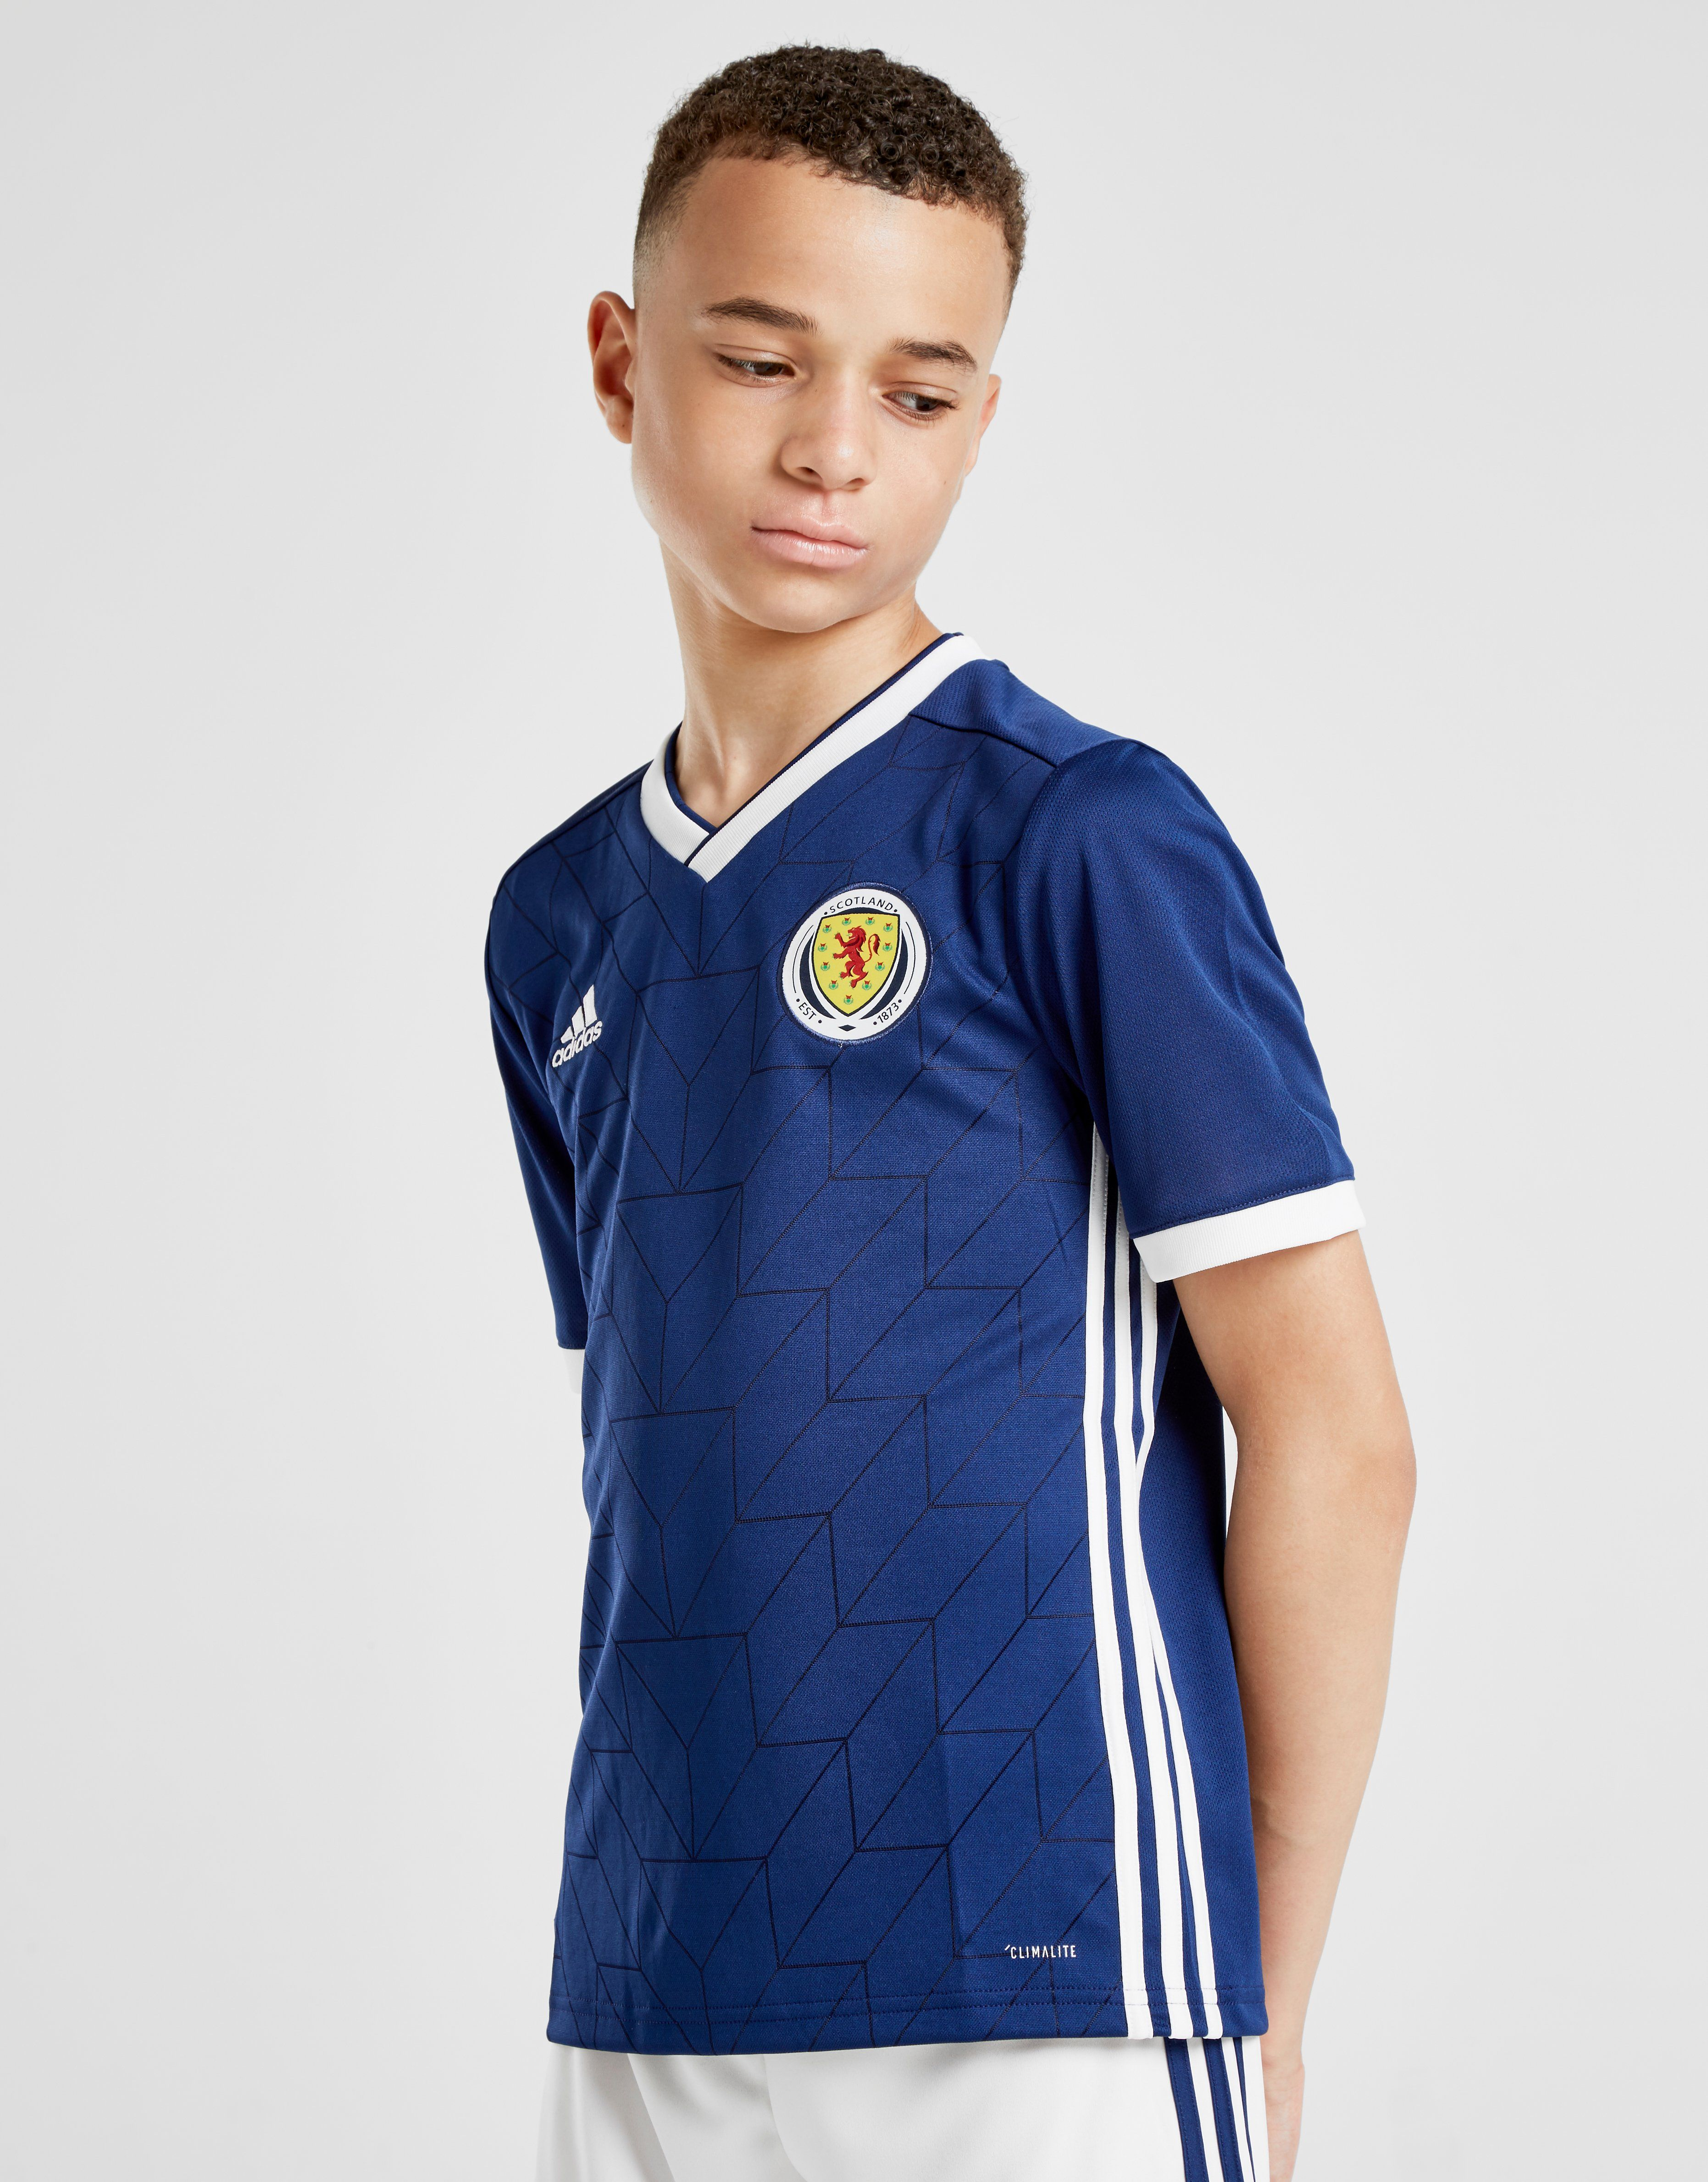 adidas Scozia 2017/18 Maglia Home Junior